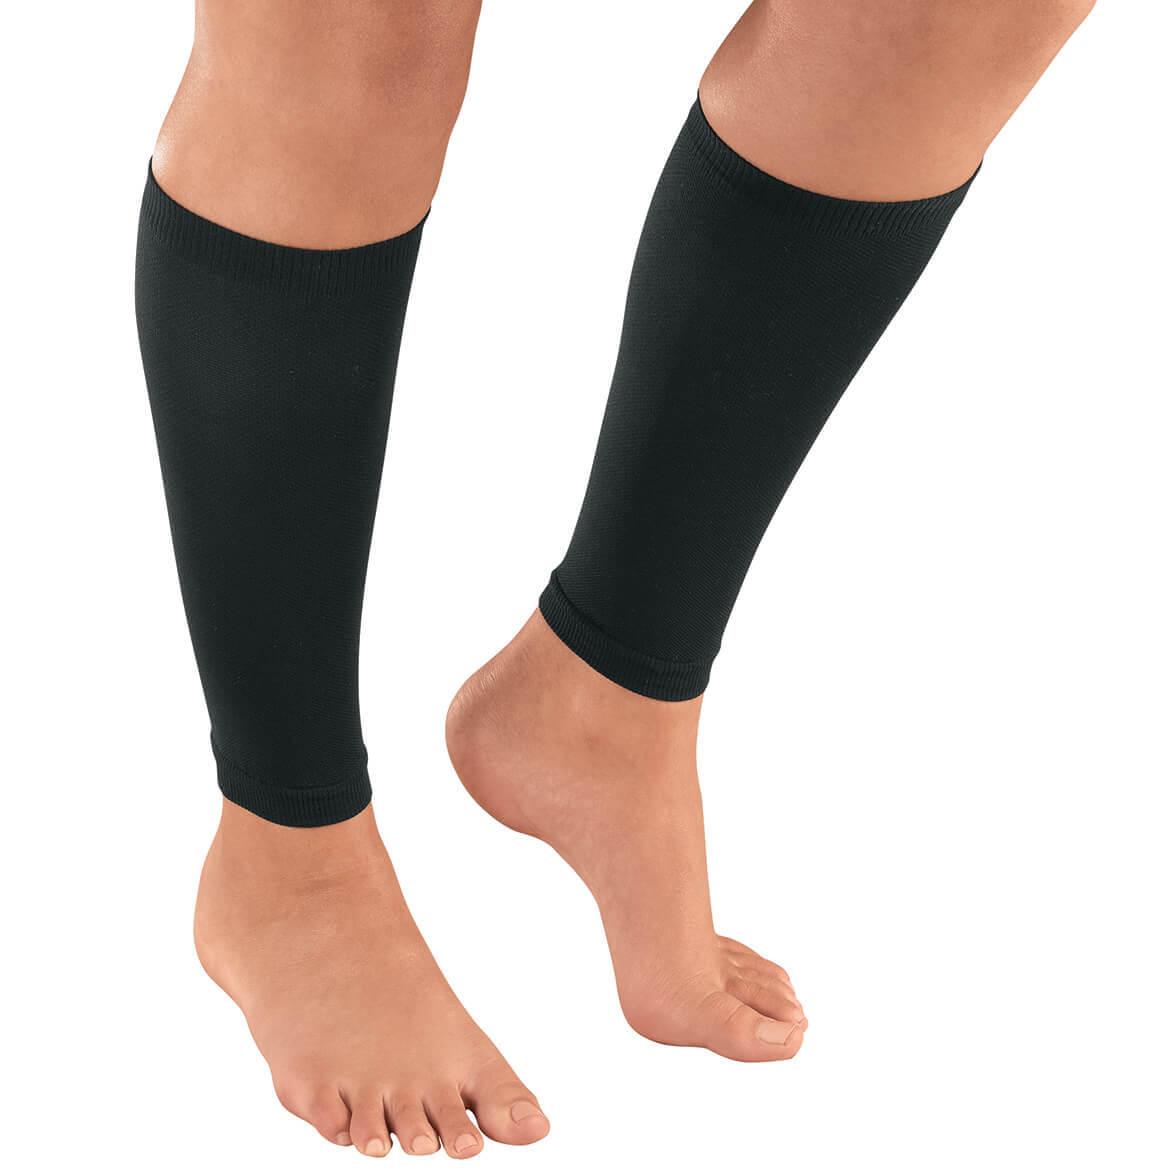 Silver Steps™ Calf Compression Sleeves, 20-30 mmHg, 1 Pair-369409